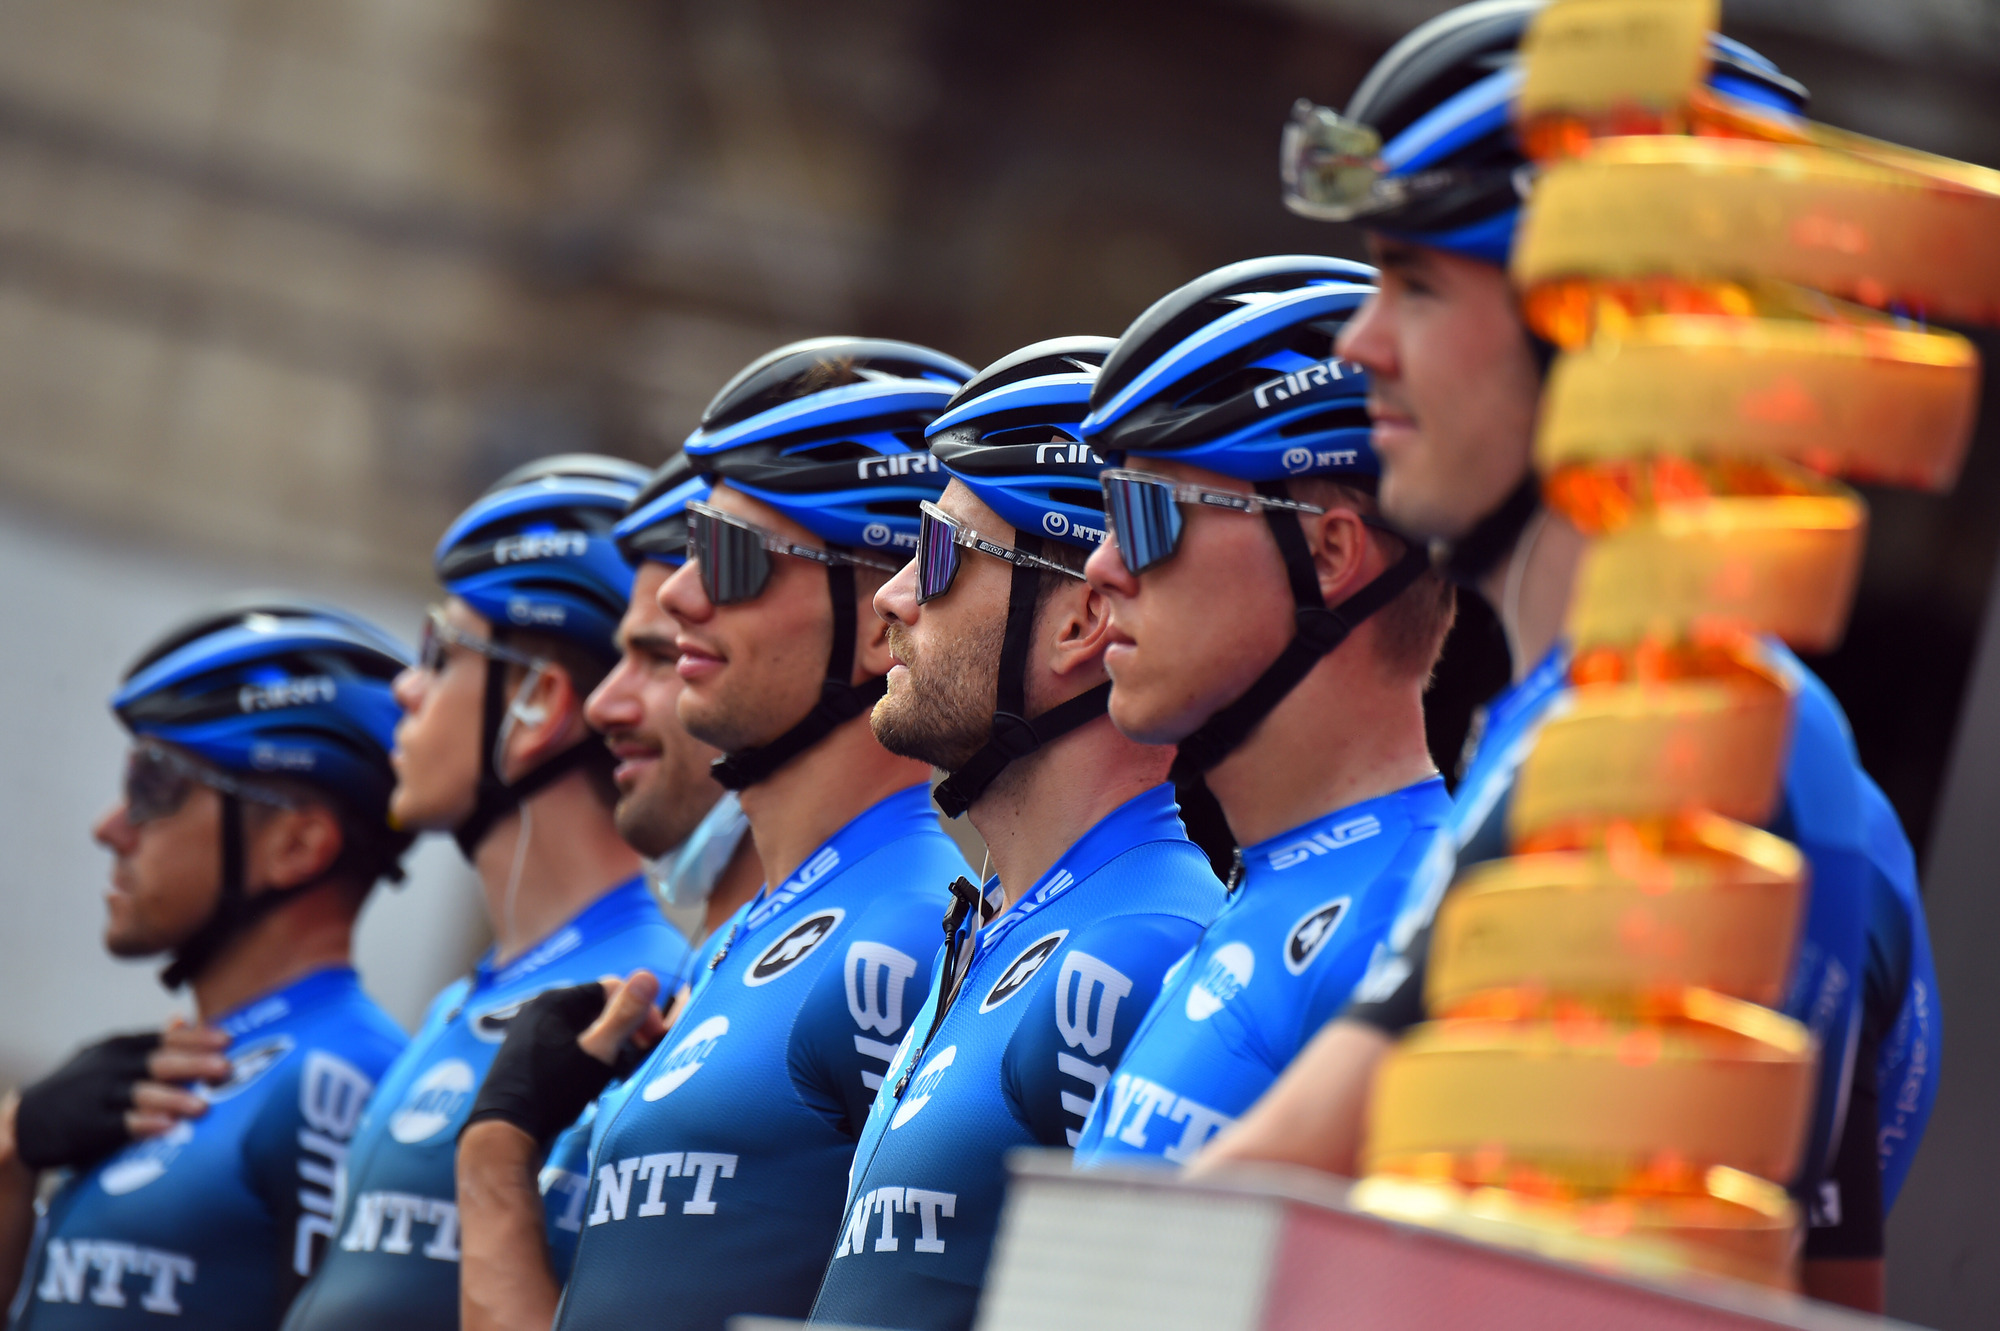 Giro d'Italia 2020 - 103th Edition - 4th stage Catania - Villafranca Tirrena 140km - 06/10/2020 - NTT Pro Cycling - photo Dario Belingheri/BettiniPhoto©2020